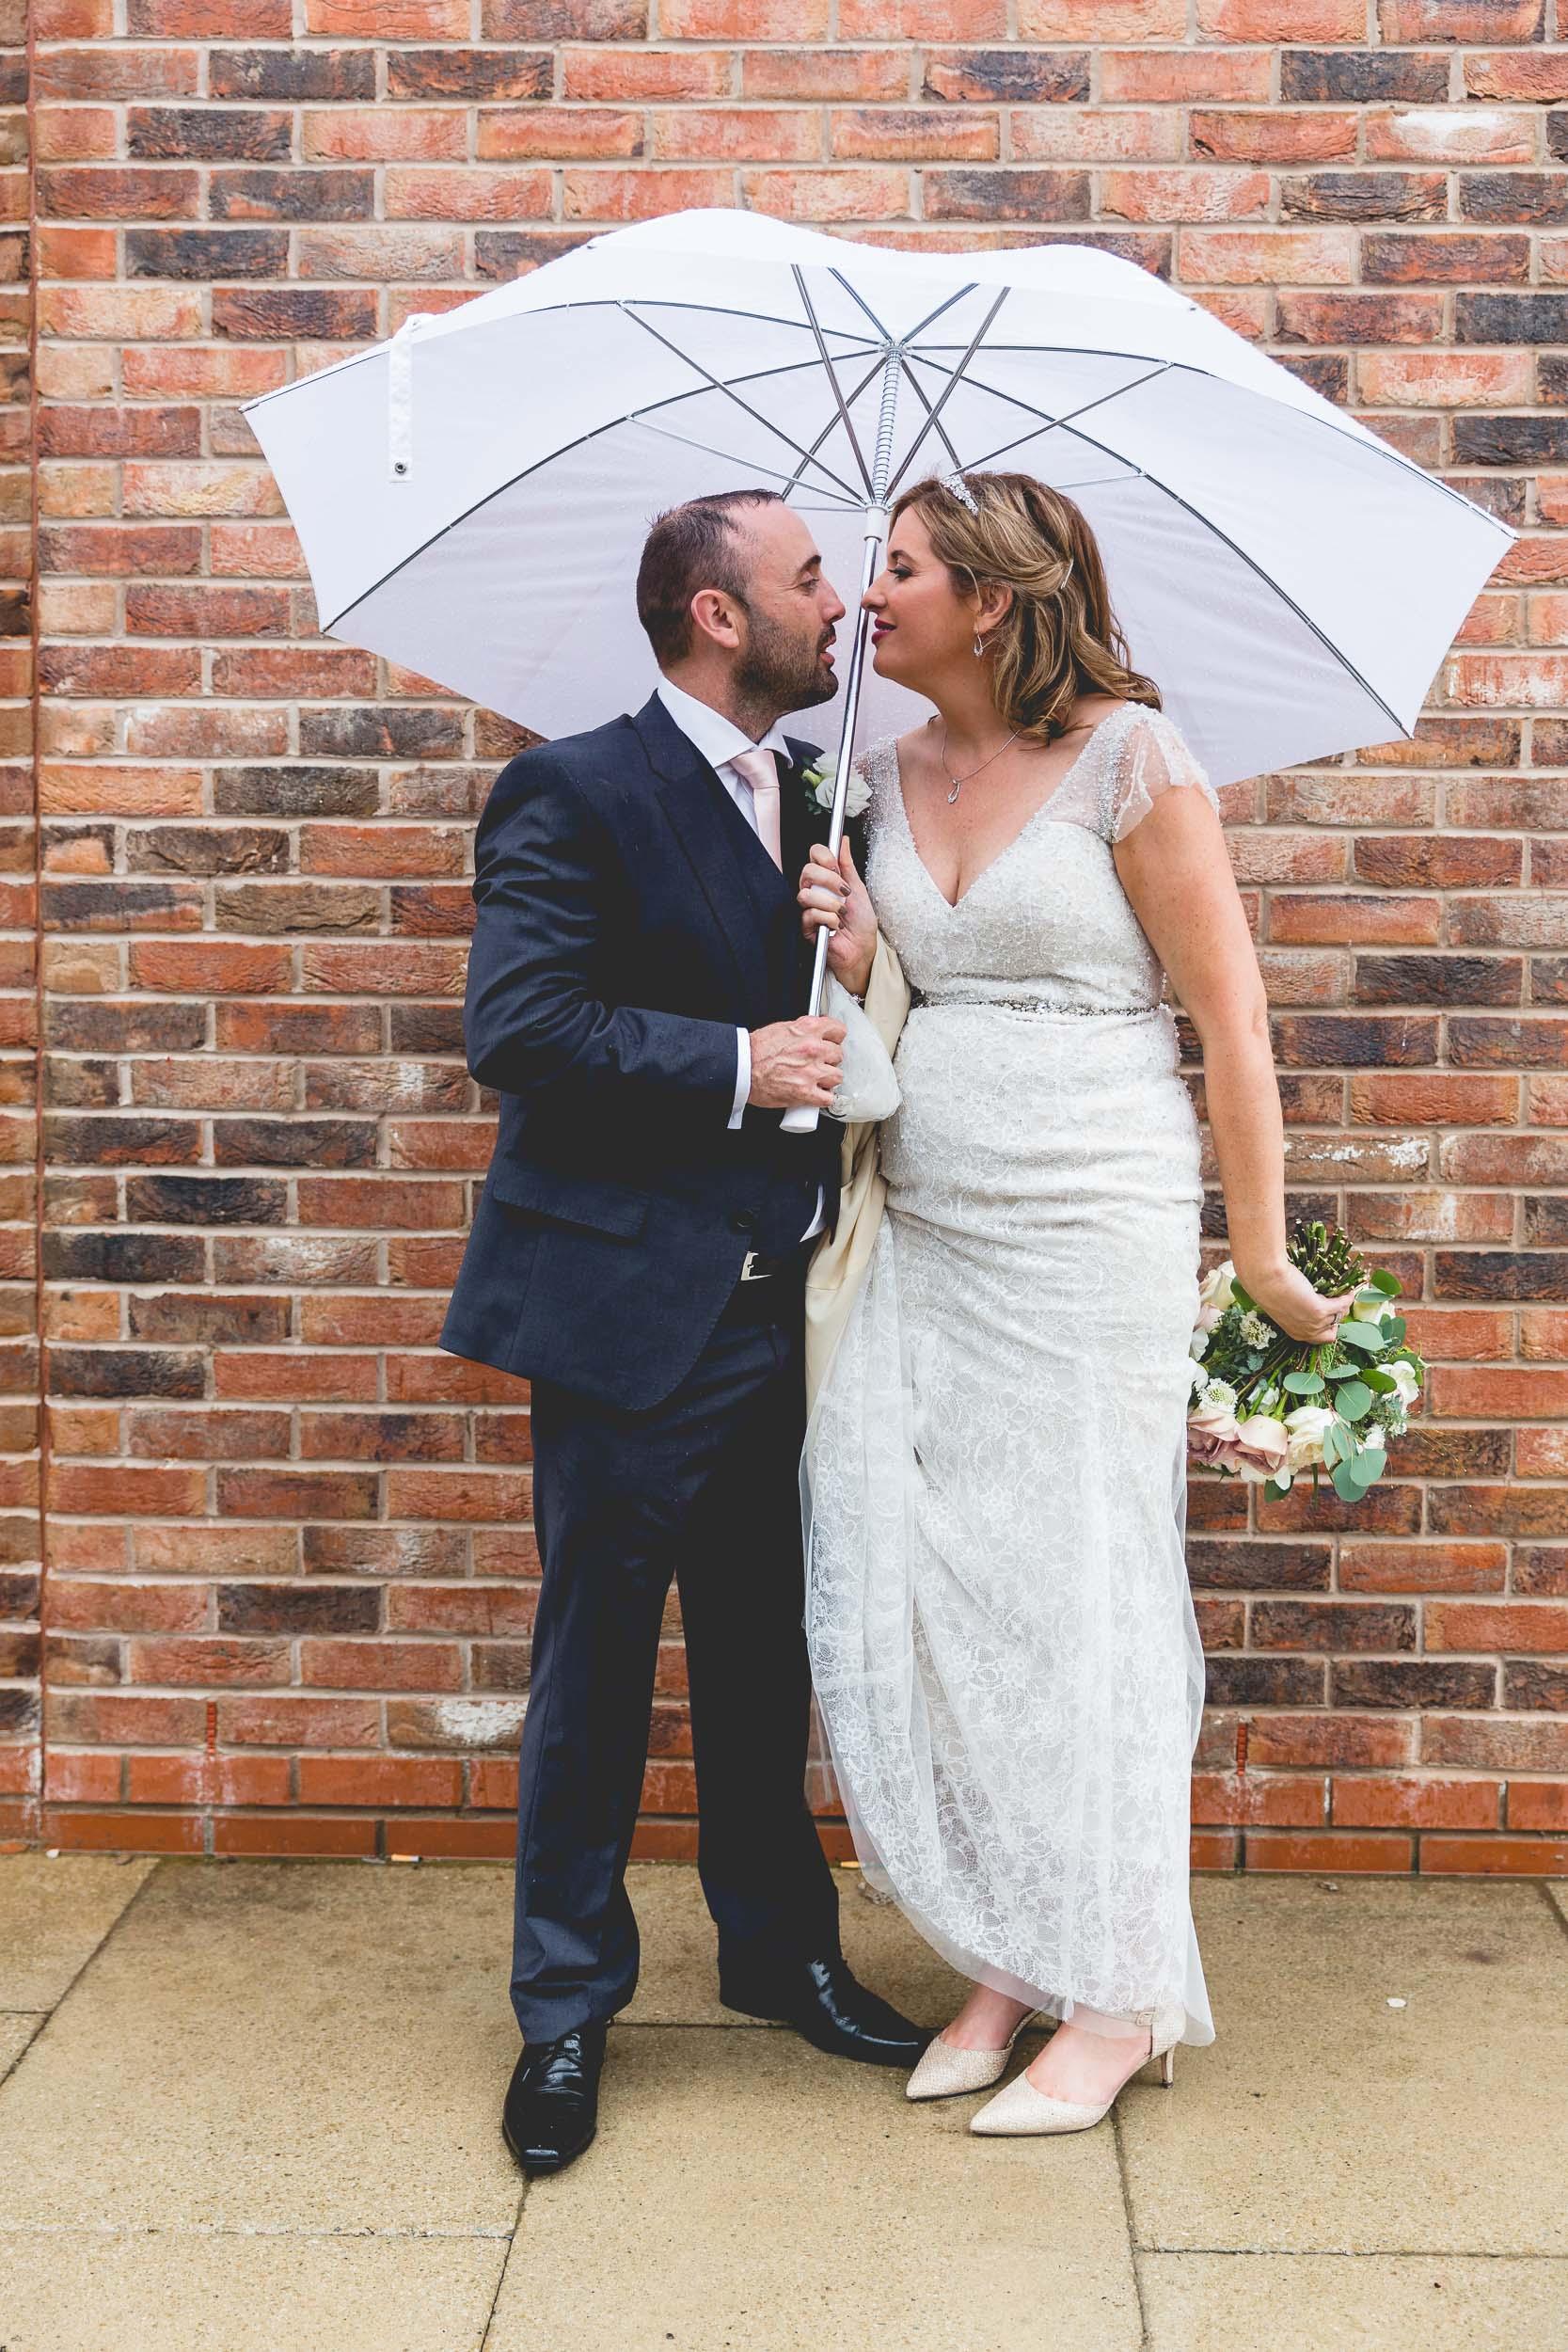 Philippa & Janek-Wedding-Halle St Peters-Manchester-photo-0388.jpg